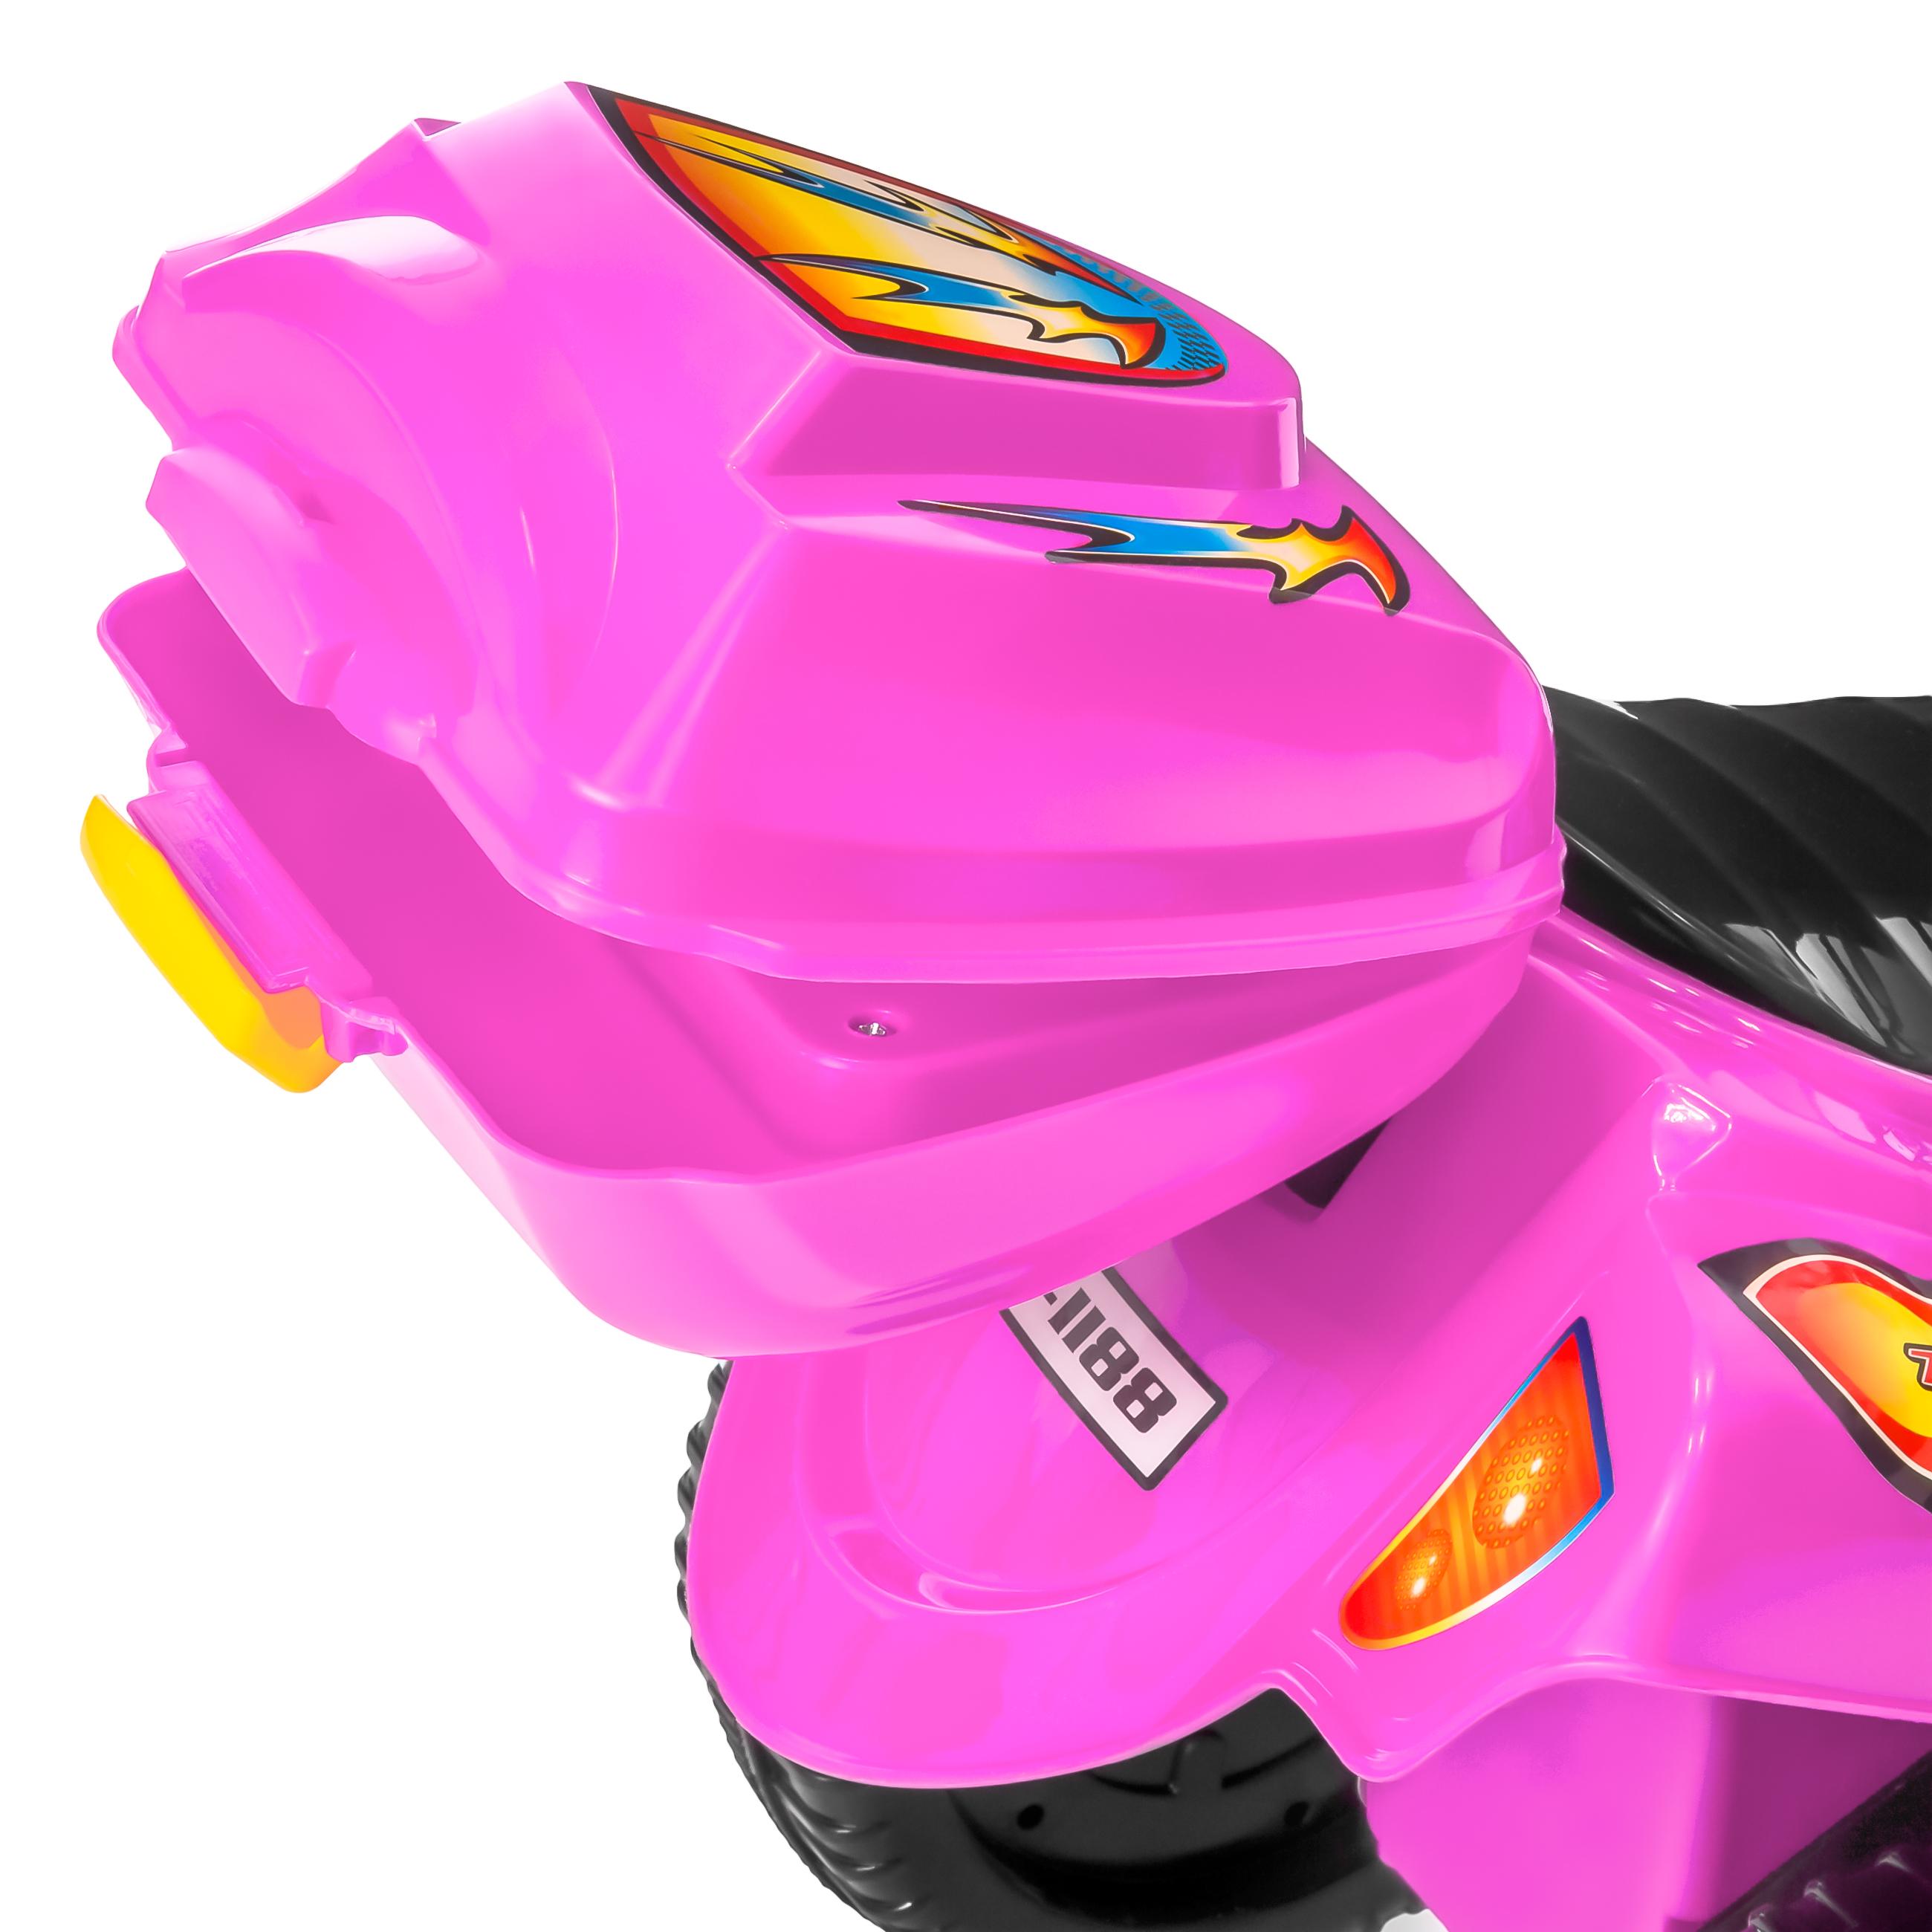 BCP-6V-Kids-3-Wheel-Motorcycle-Ride-On-Toy-w-LED-Lights-Music-Storage thumbnail 27